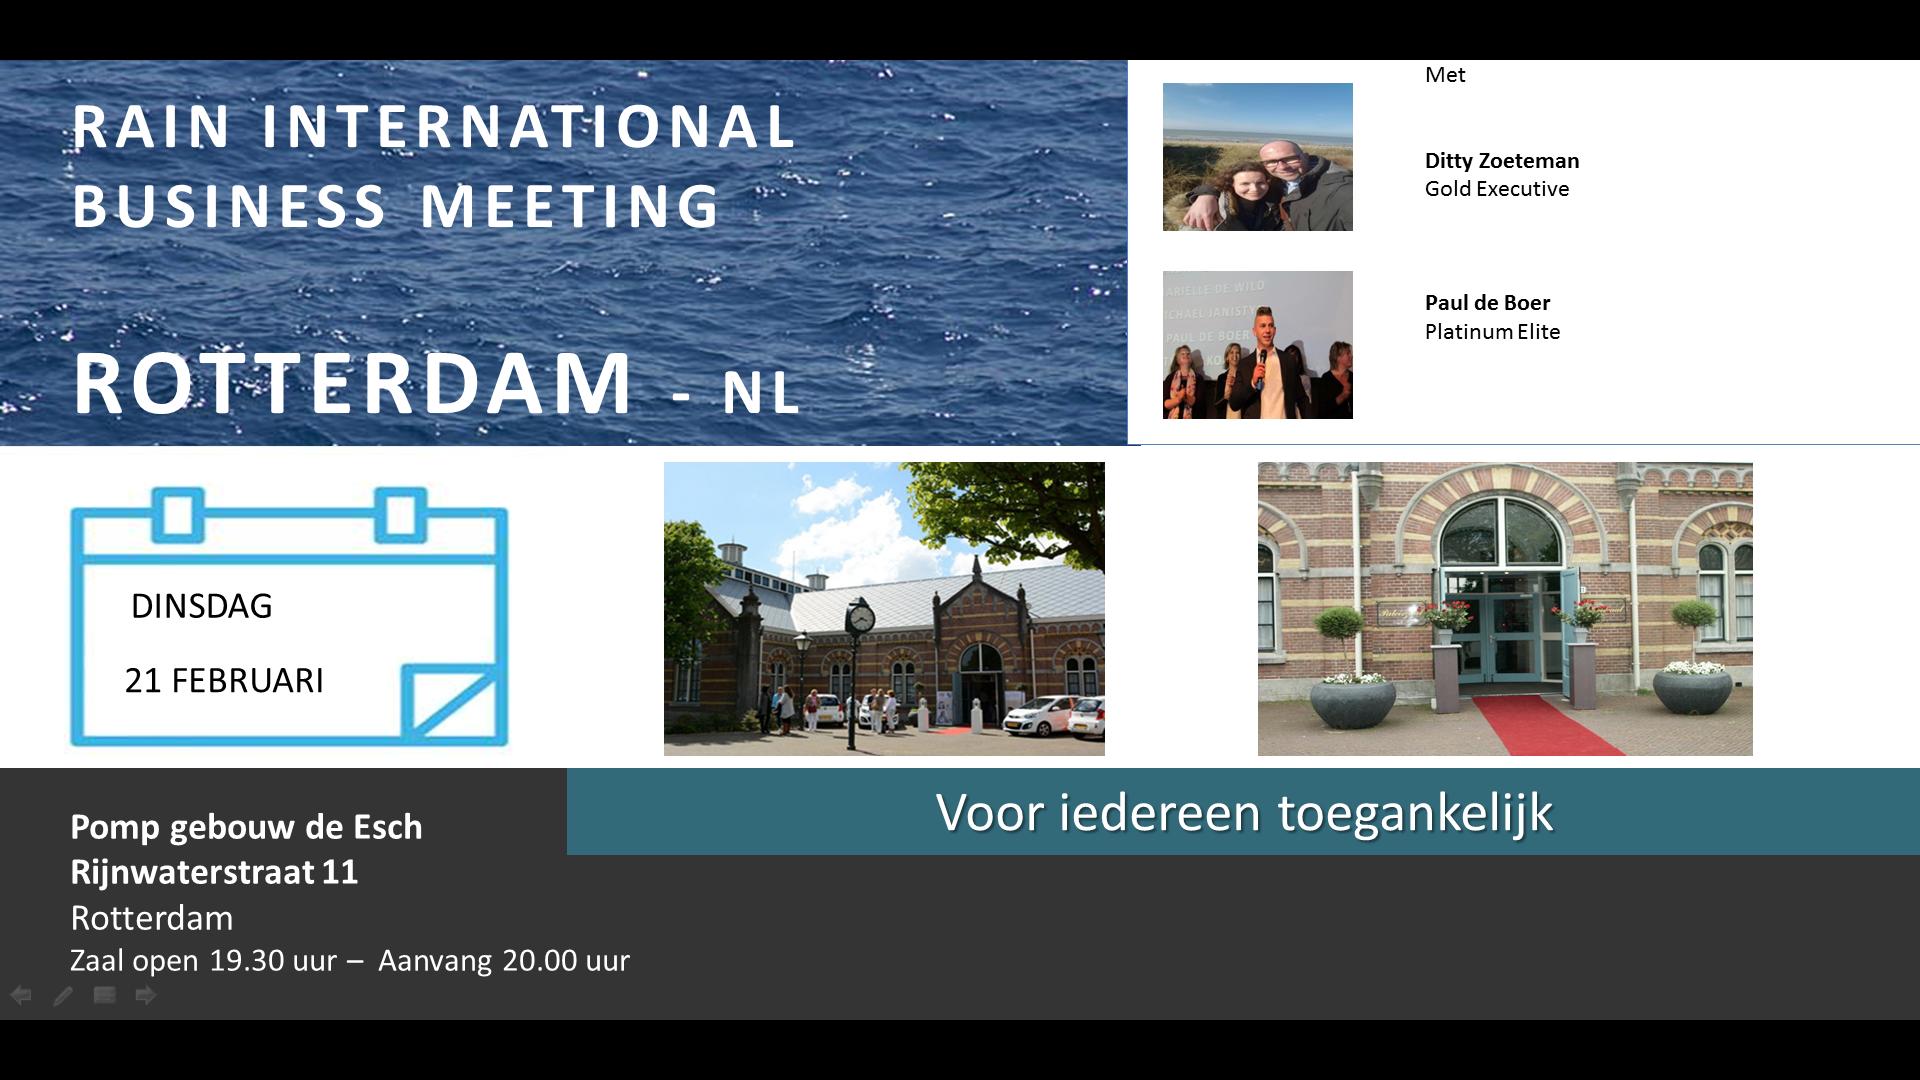 RAIN INTERNATIONAL Business Meeting Rotterdam